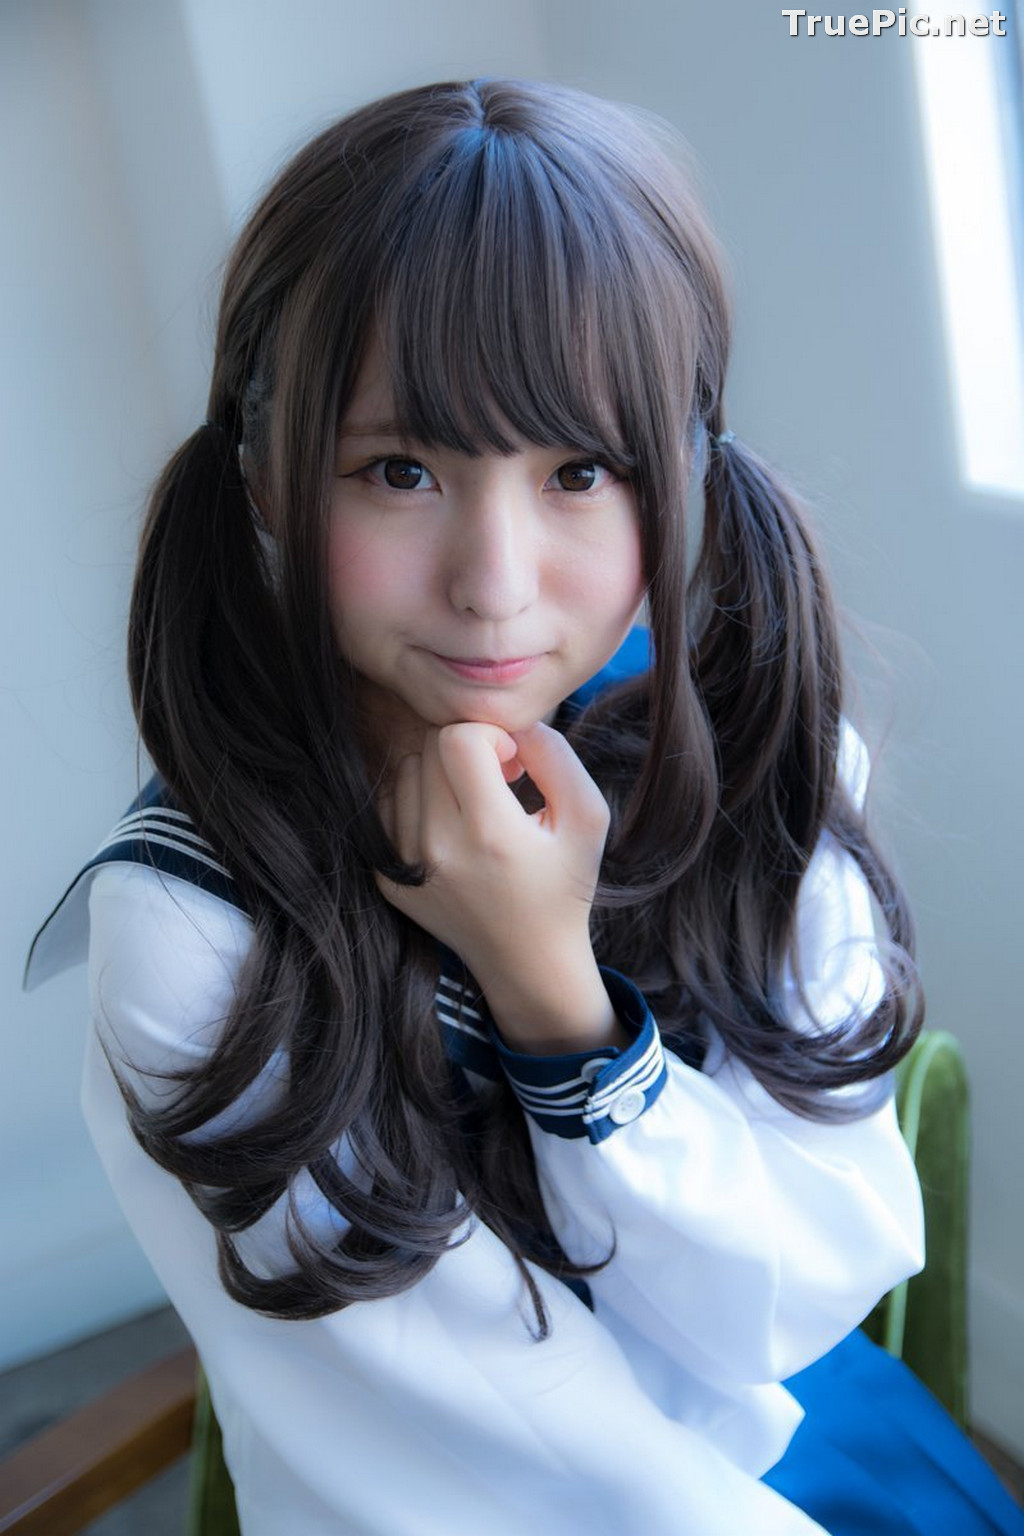 Image Japanese Model - Ennui Mamefu - Cute Cosplay Girl - TruePic.net - Picture-8